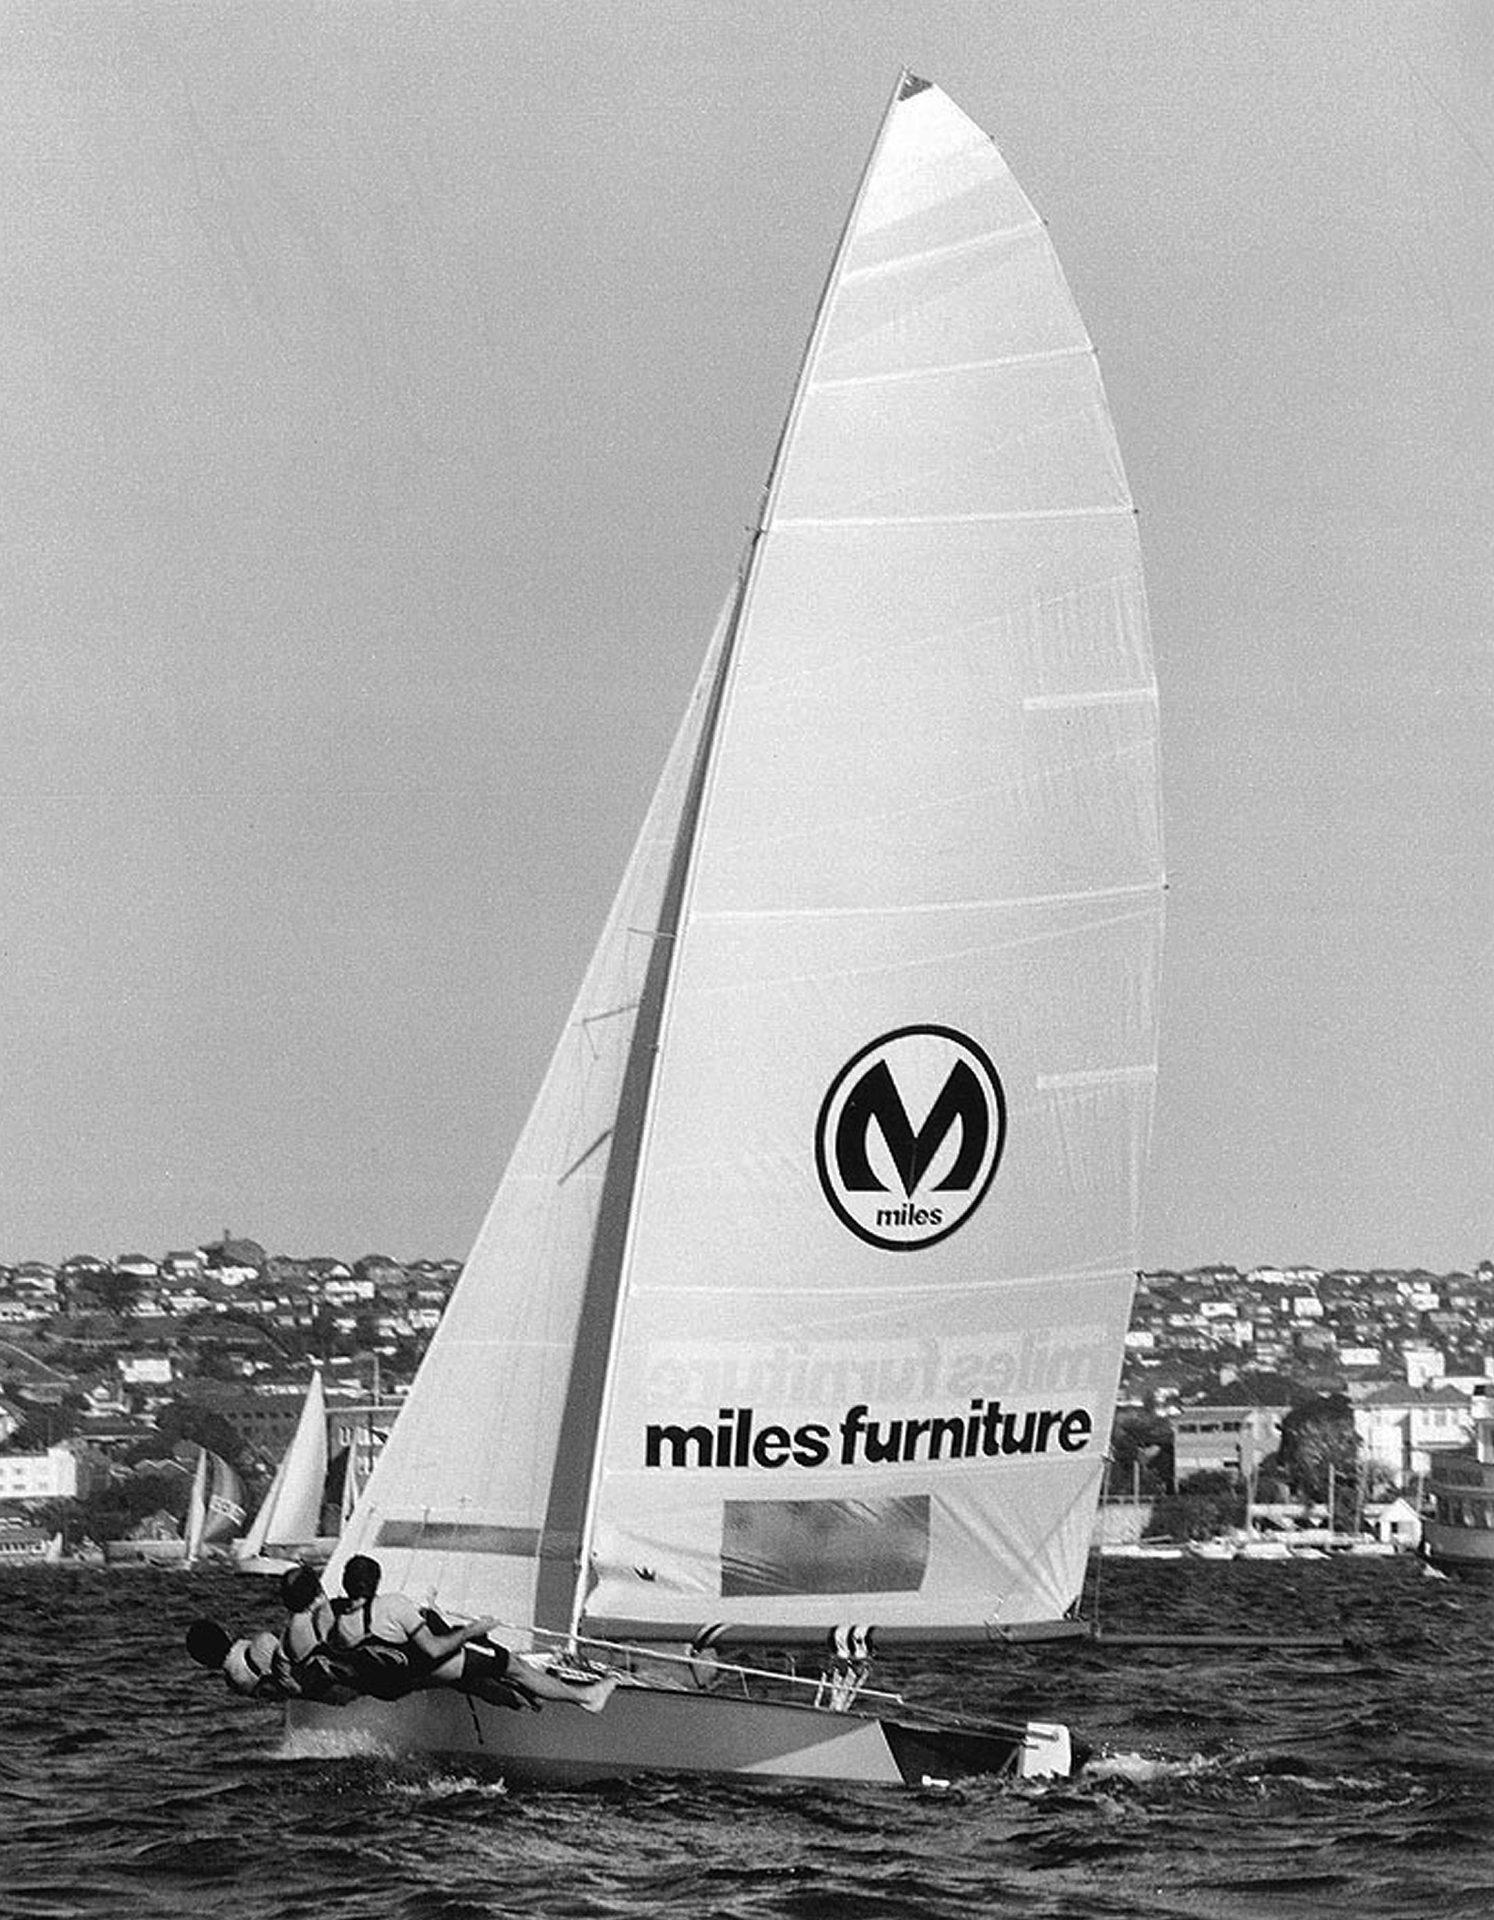 18ft Skiffs The Kulmar Family - Miles Furniture, 1976 Giltinan champion, upwind on Sydney Harbour